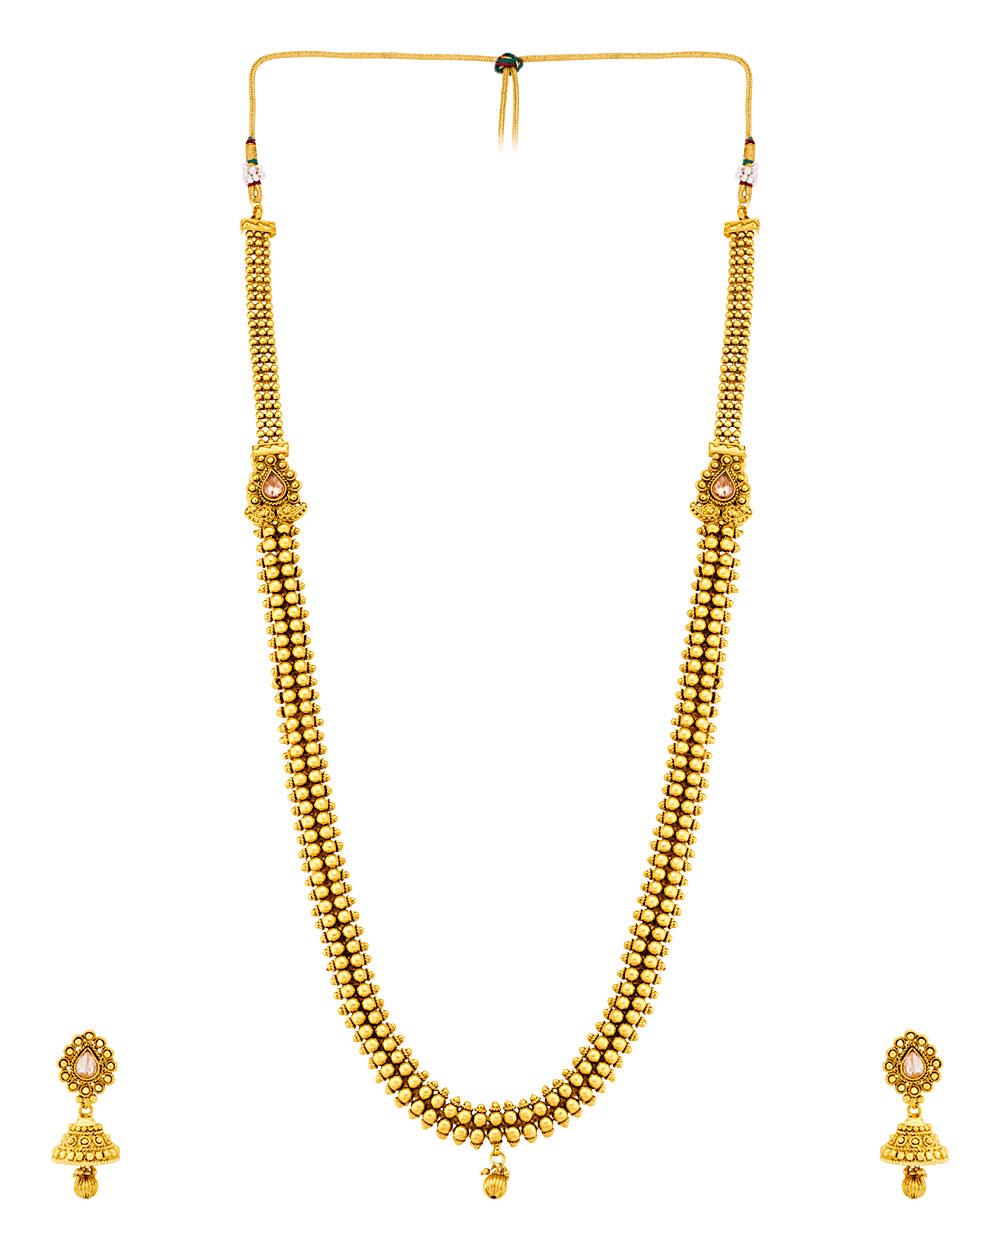 Buy Alluring Gold Plated Sanskriti Rani Haar Necklace Set Online ...